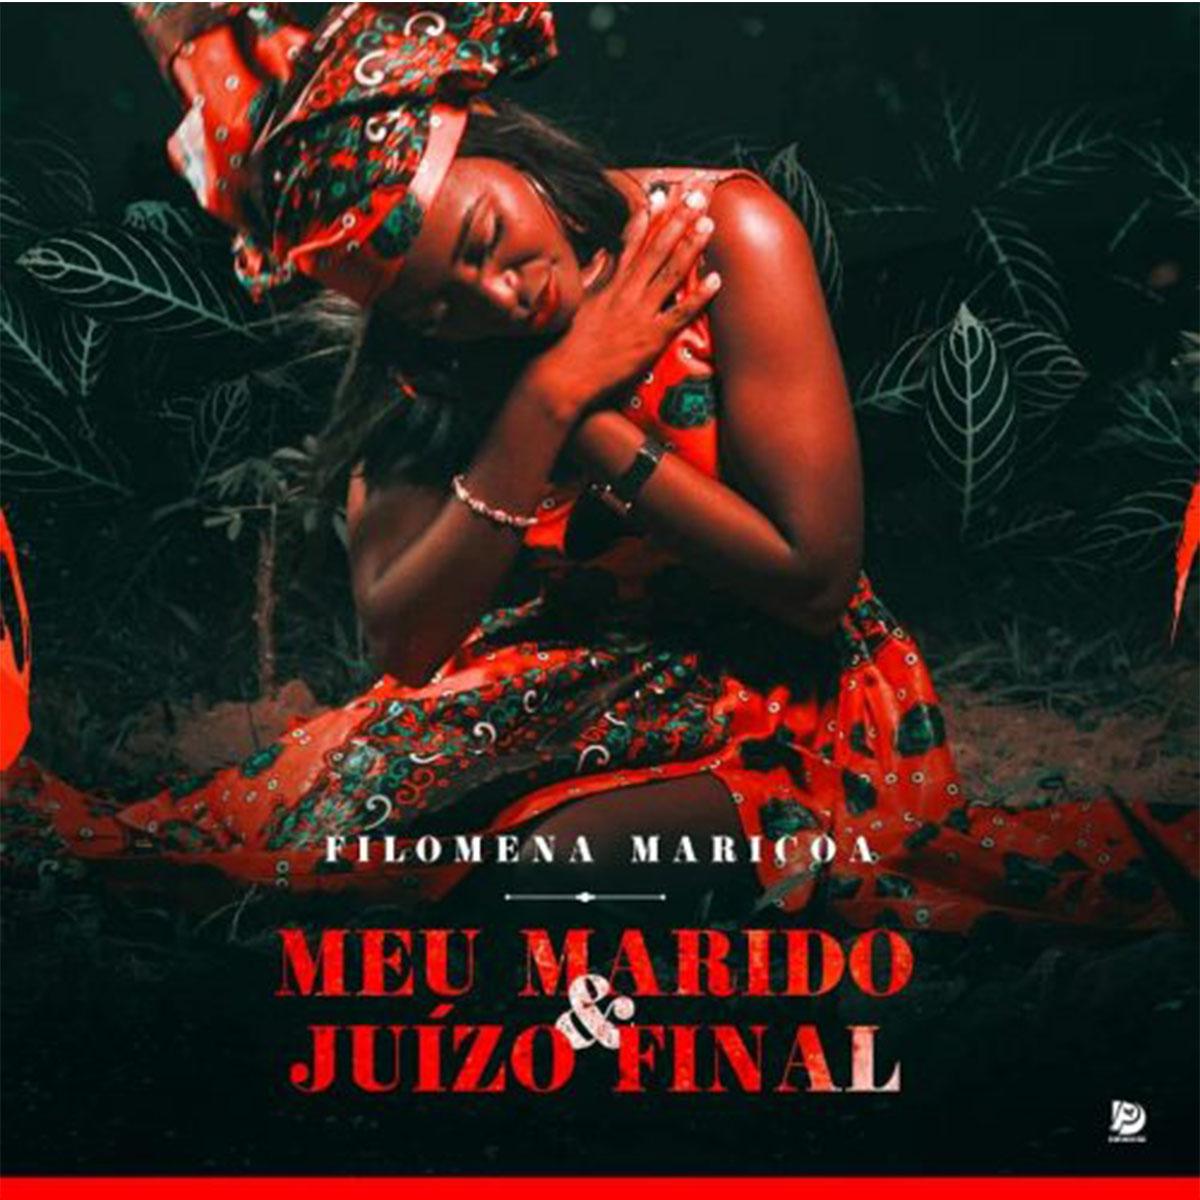 Filomena Maricoa - Juizo Final